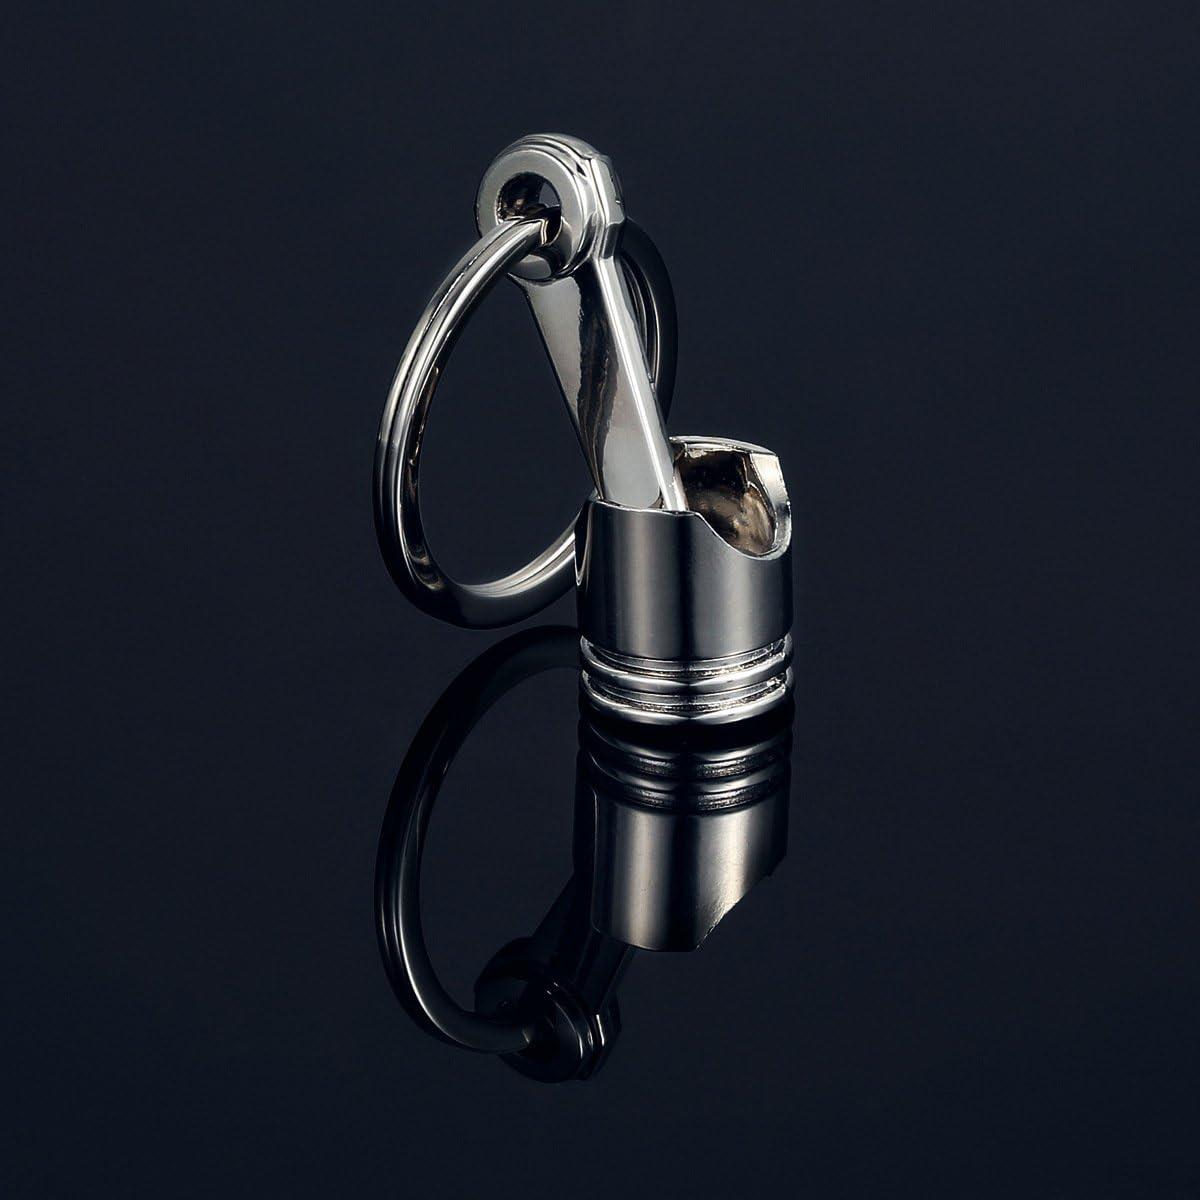 1 Pcs Fun Engine Auto Car Part Silver Metal Piston Model Shape Alloy Keychain Keyring Keyfob(Silver)